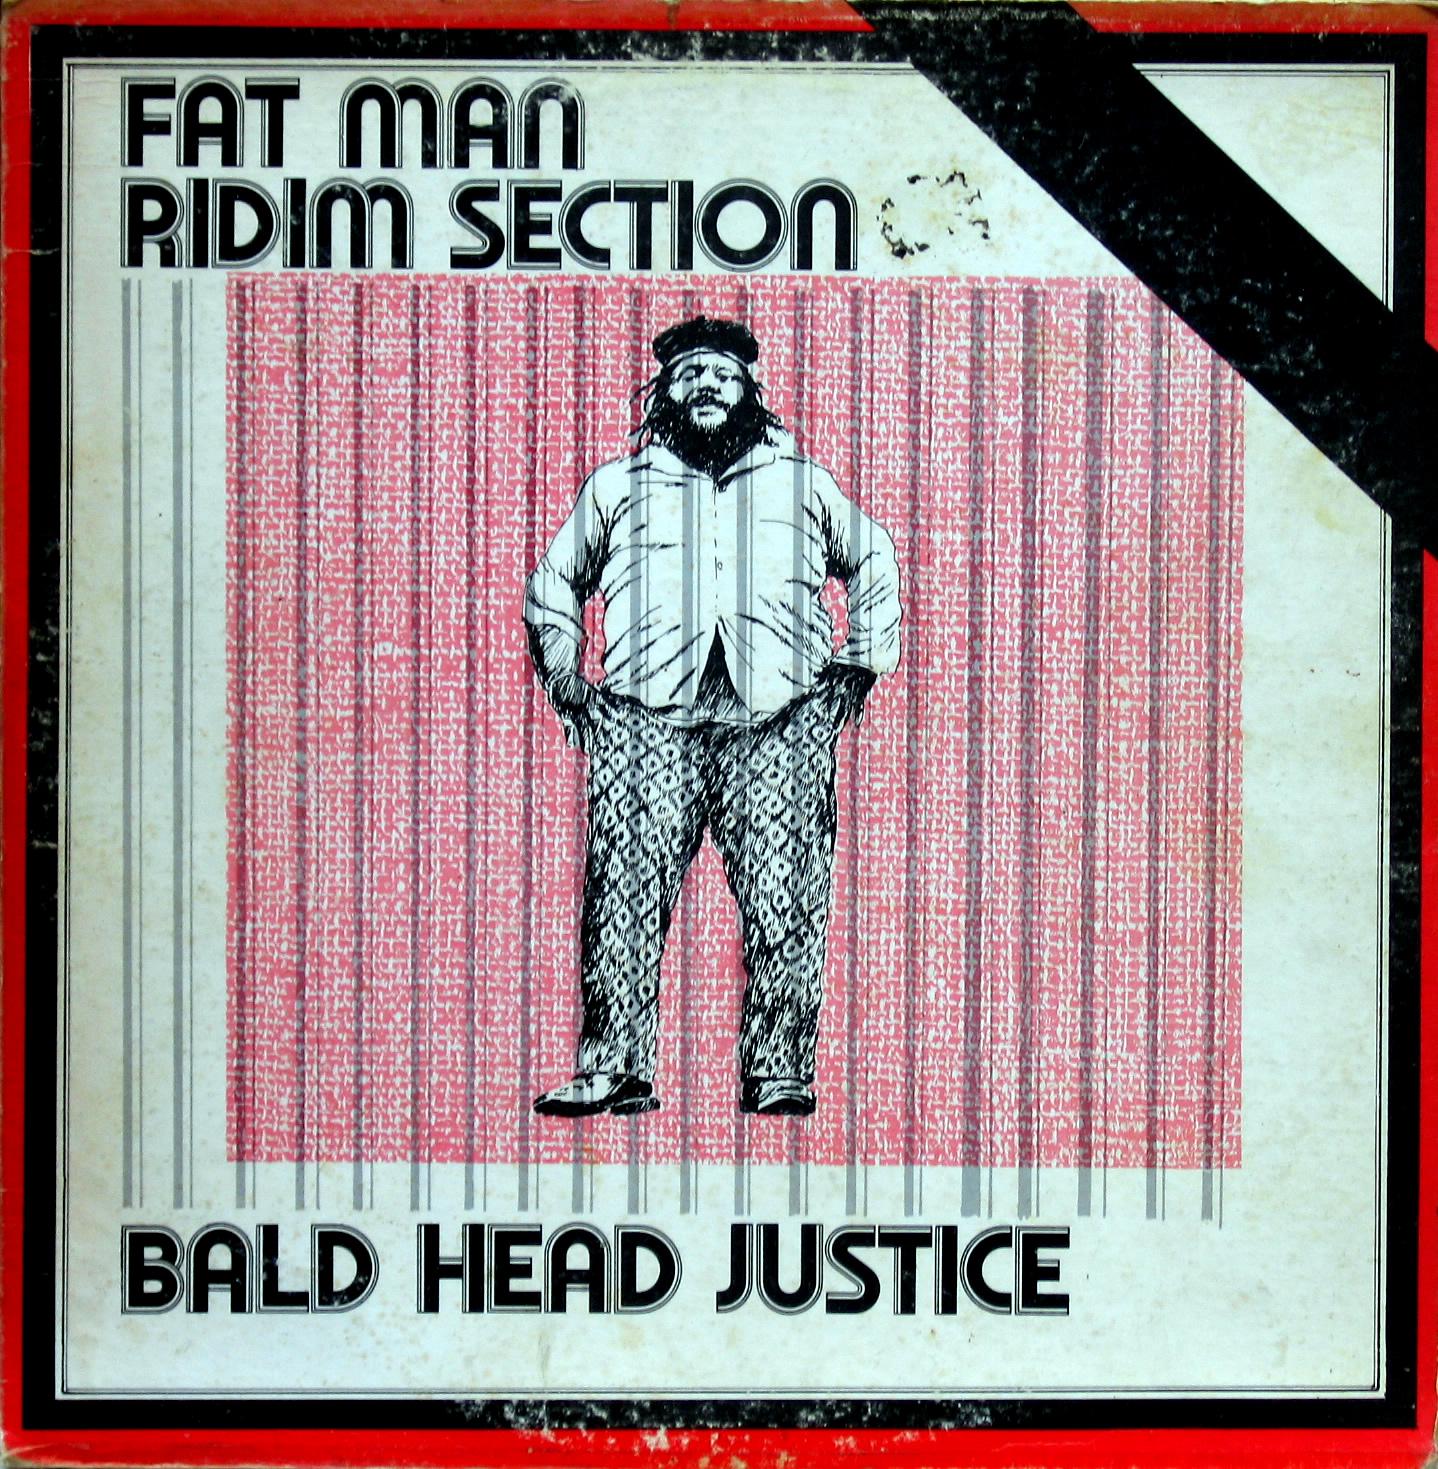 03 Baldhead Justice.jpg